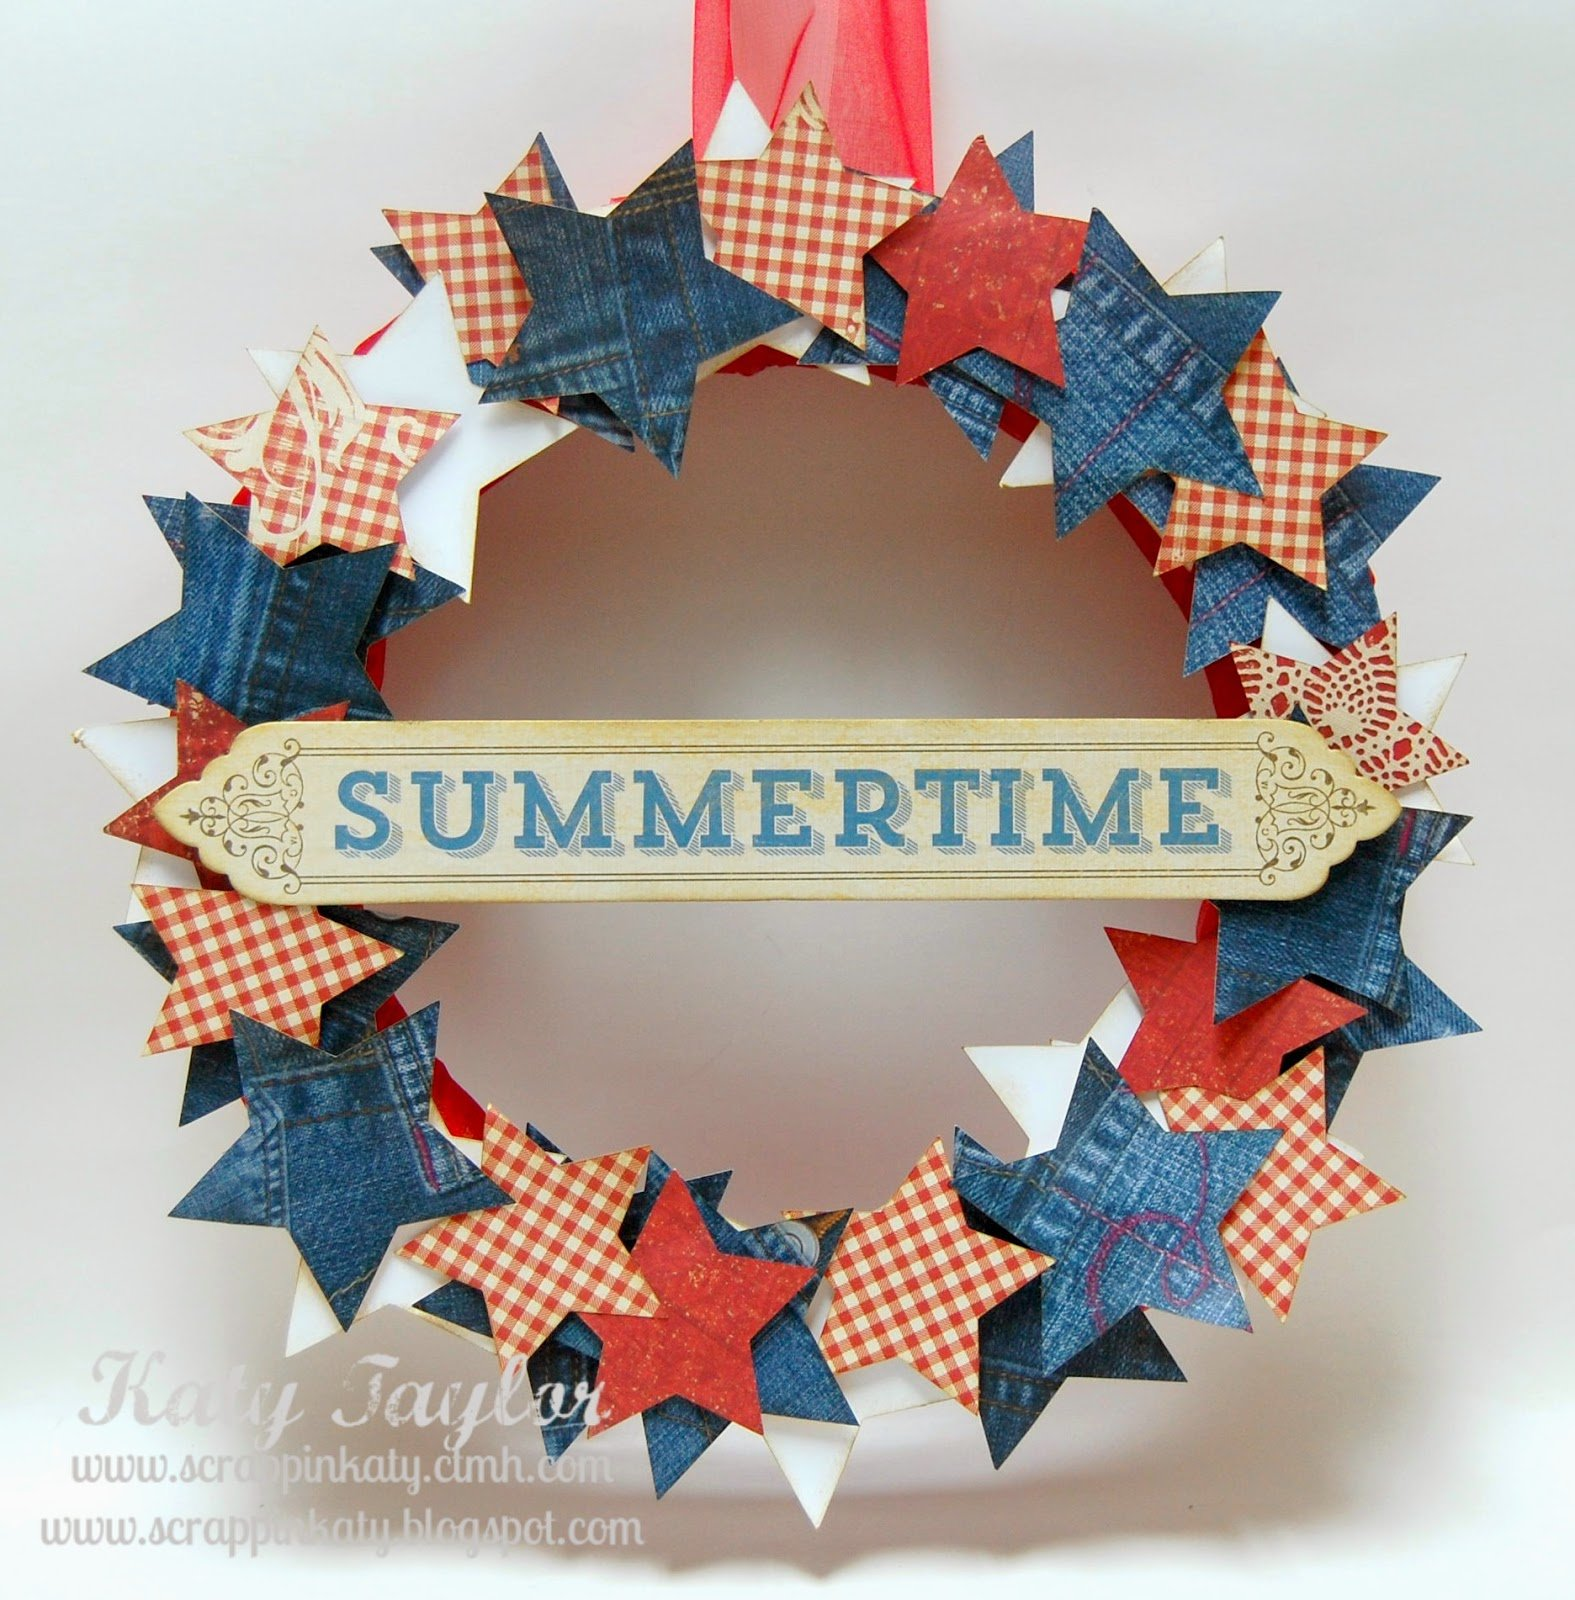 Summertime Wreath